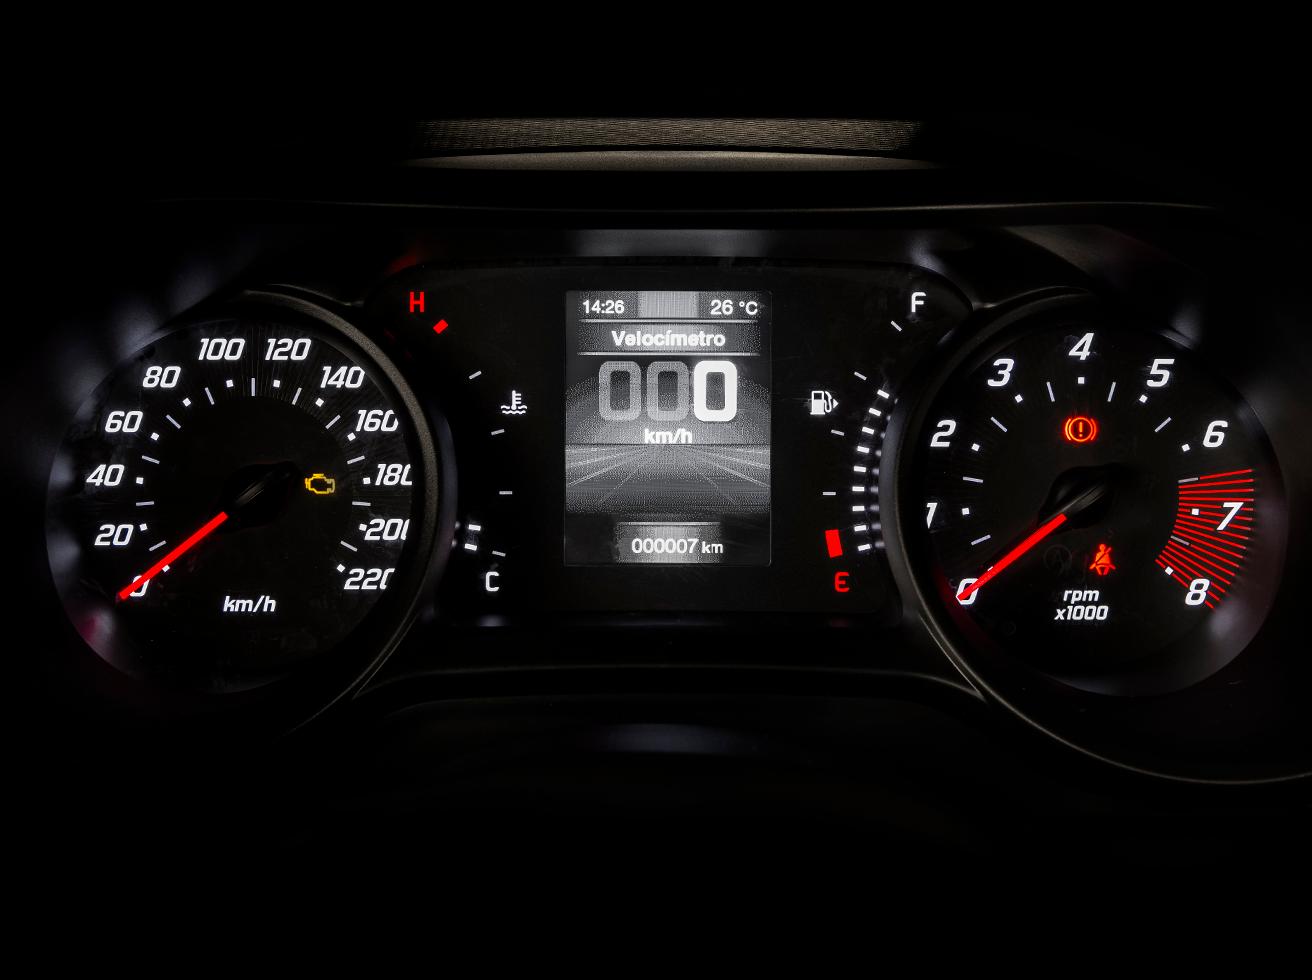 1.0 FIREFLY FLEX DRIVE MANUAL